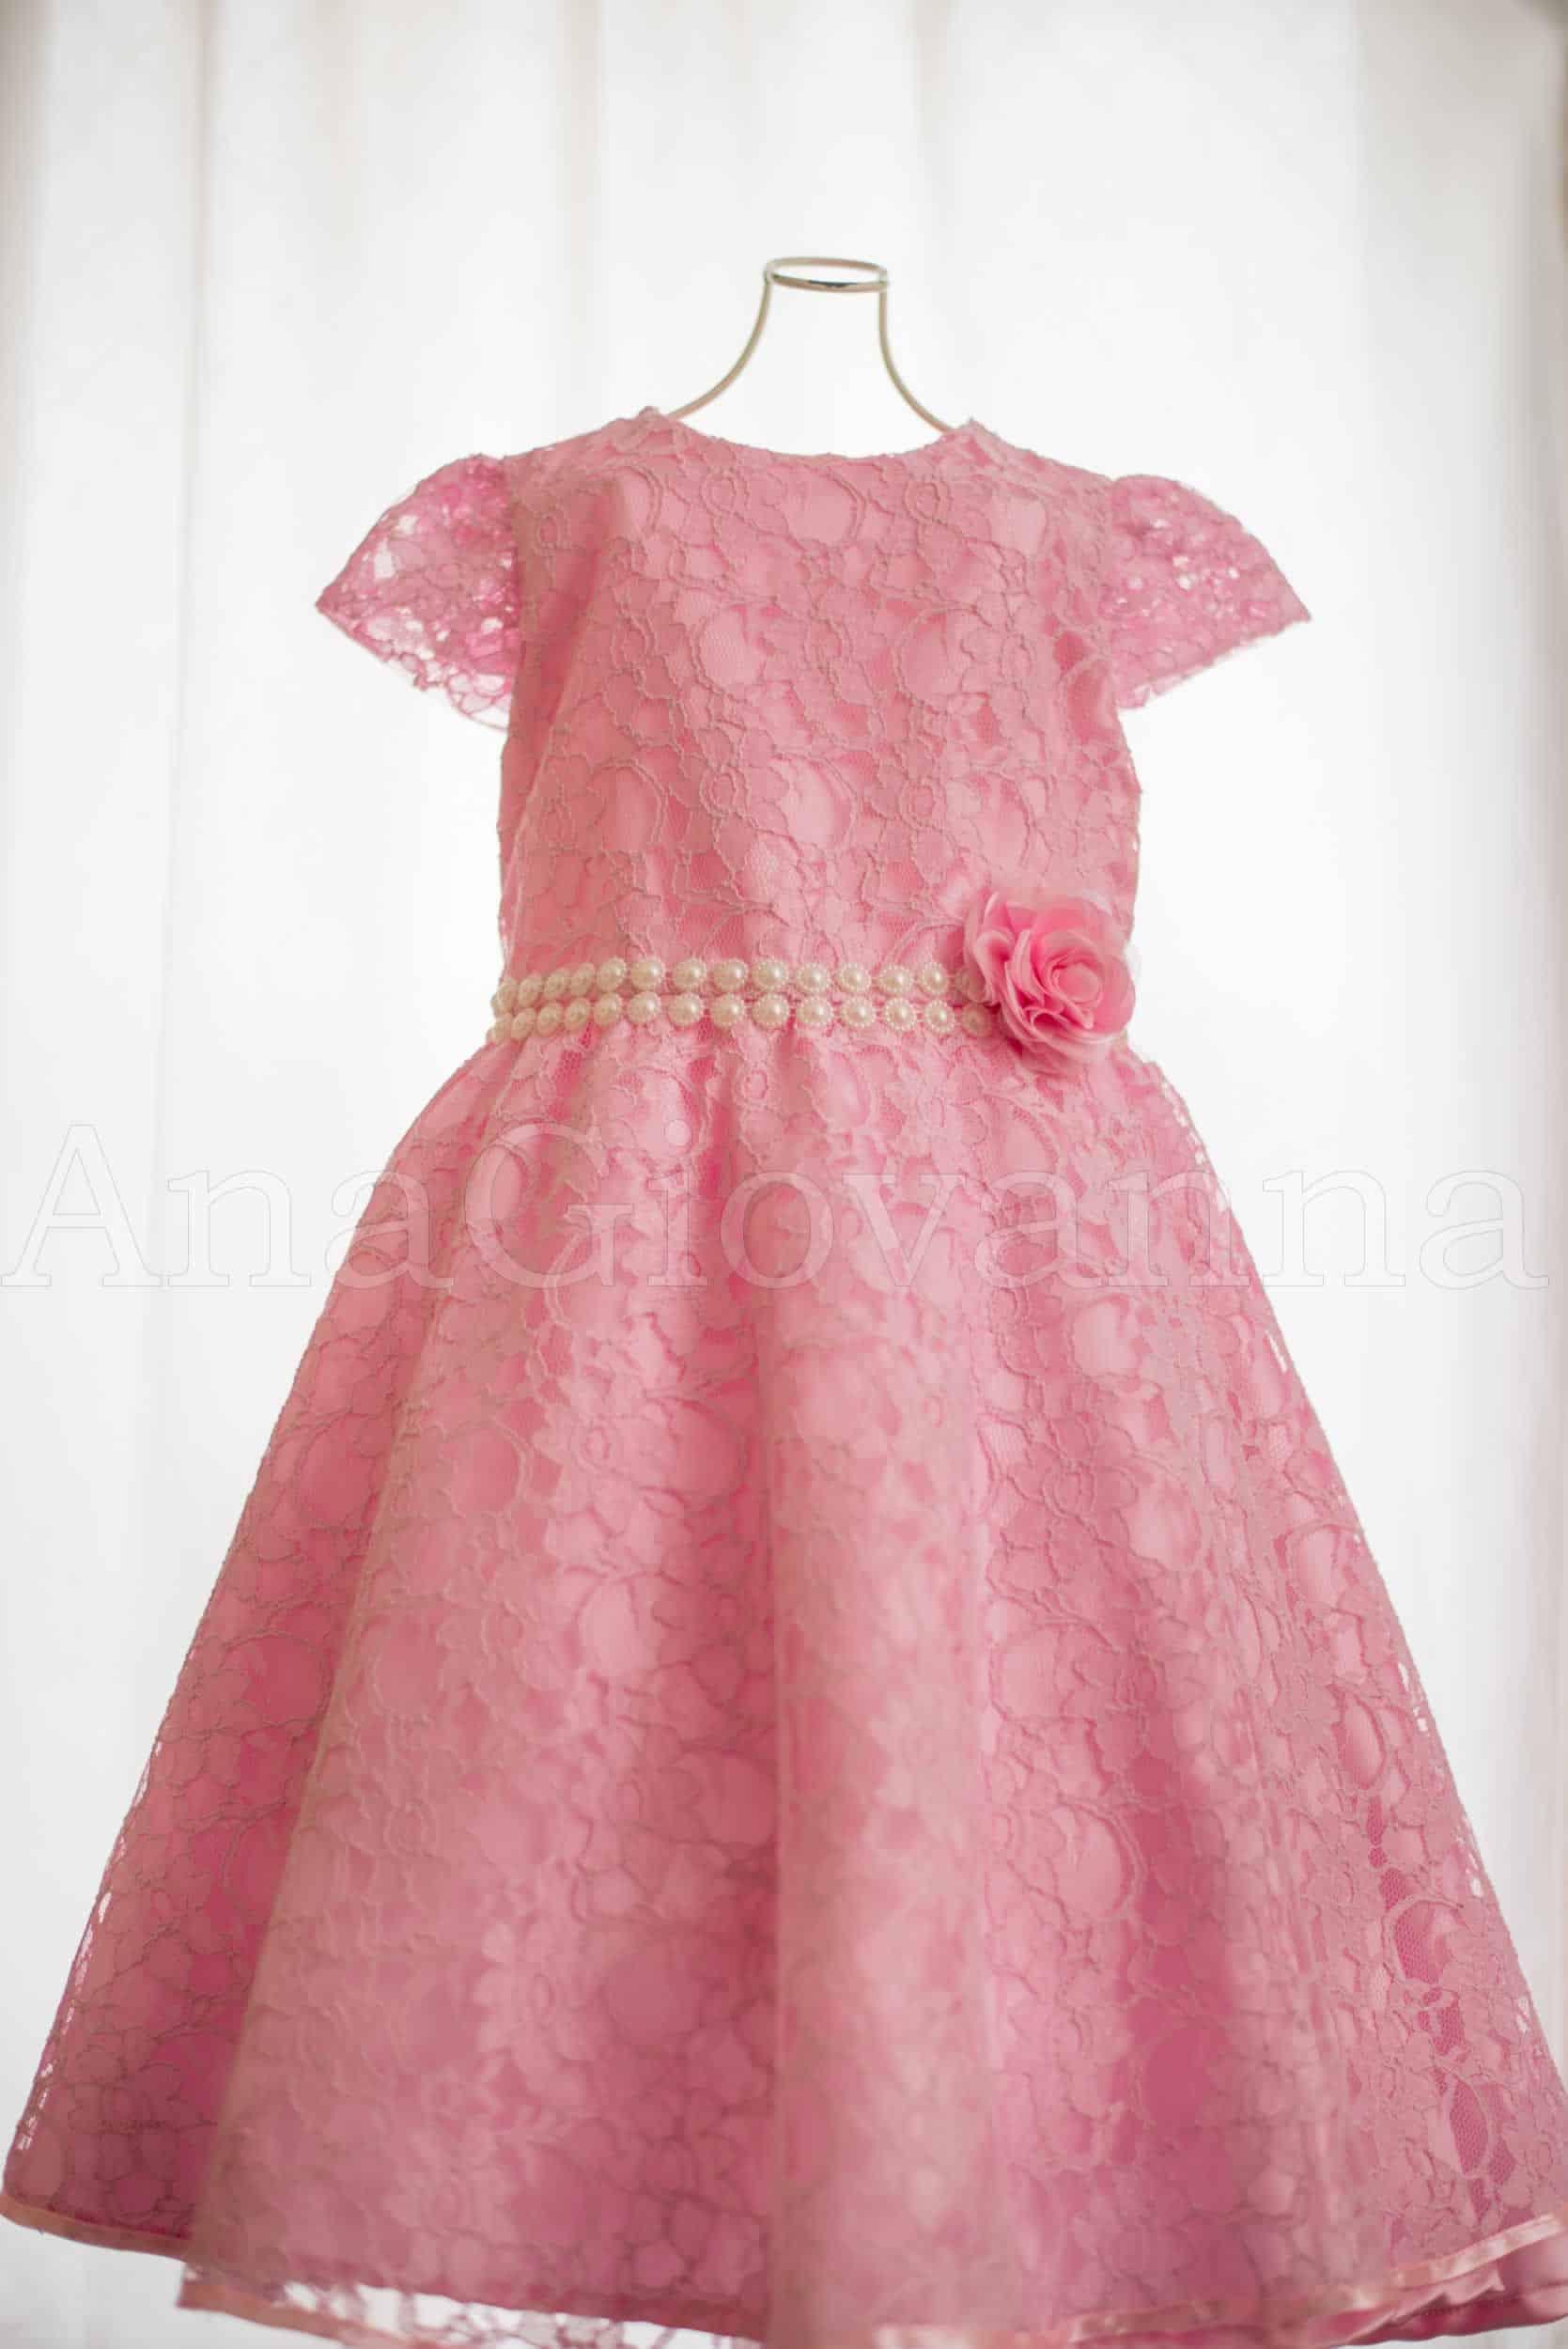 Vestido infantil de princesa rosa